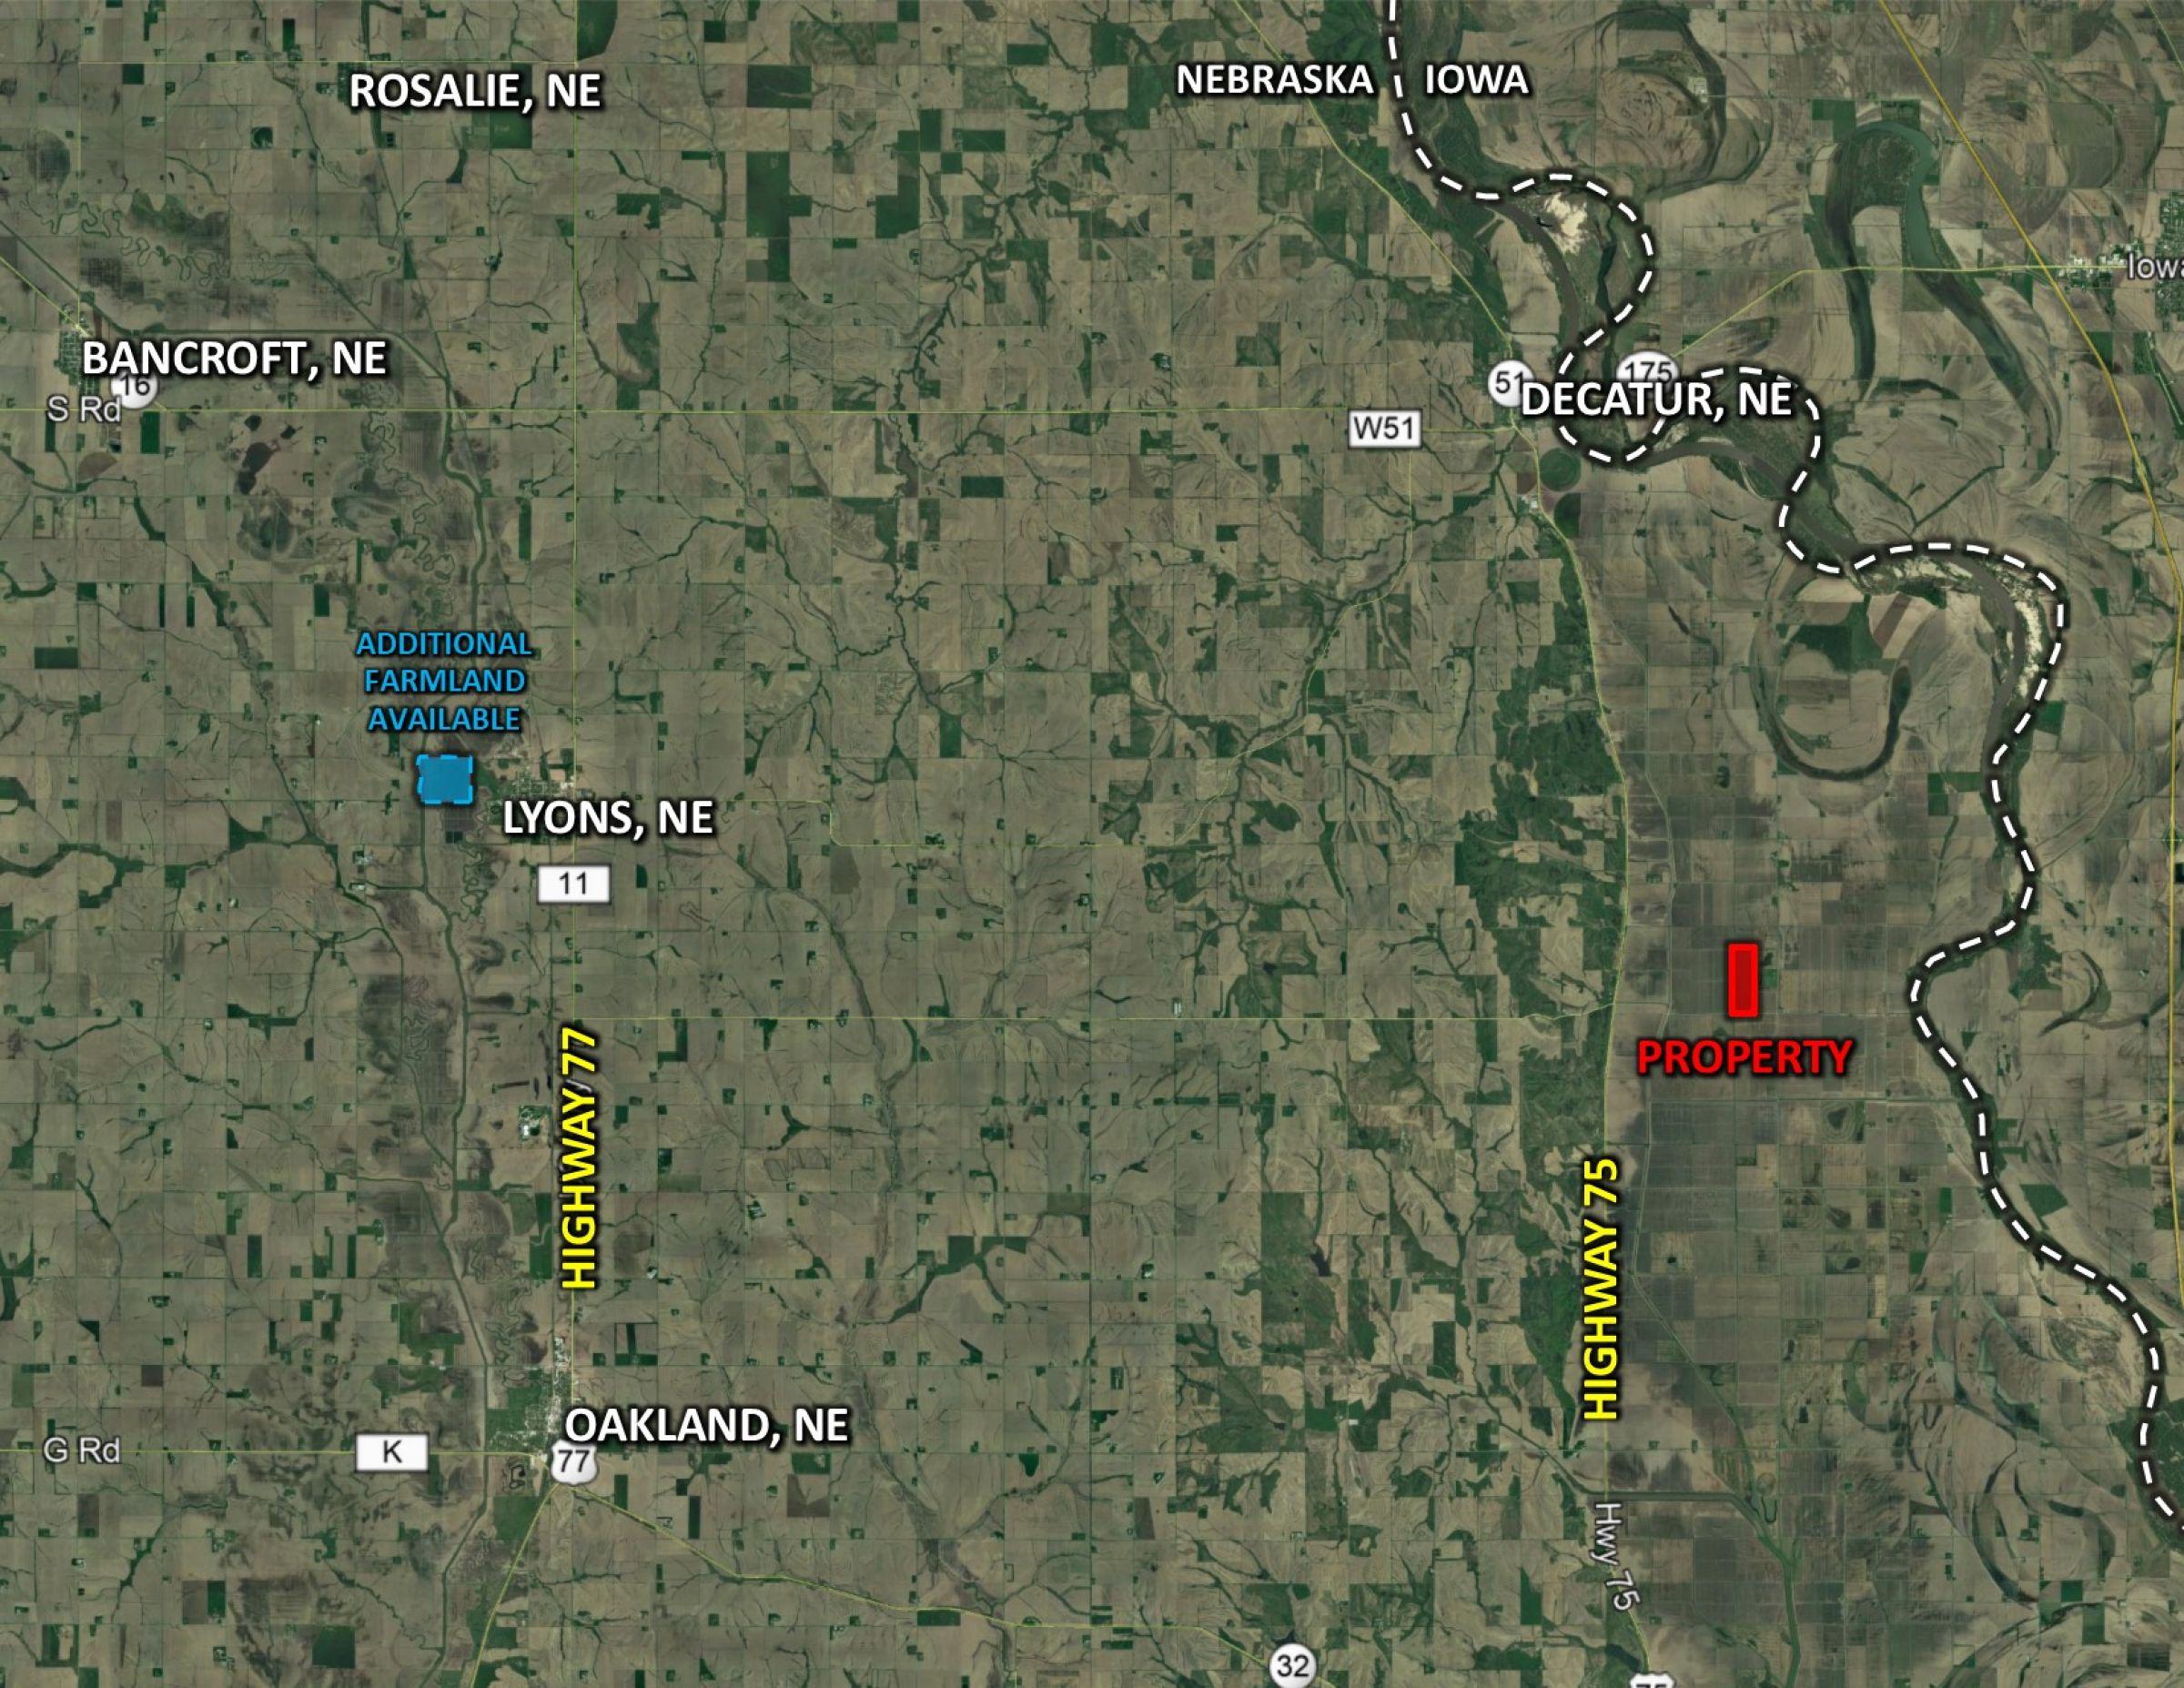 14722-county-road-p-0-2019-10-14-183631.jpg